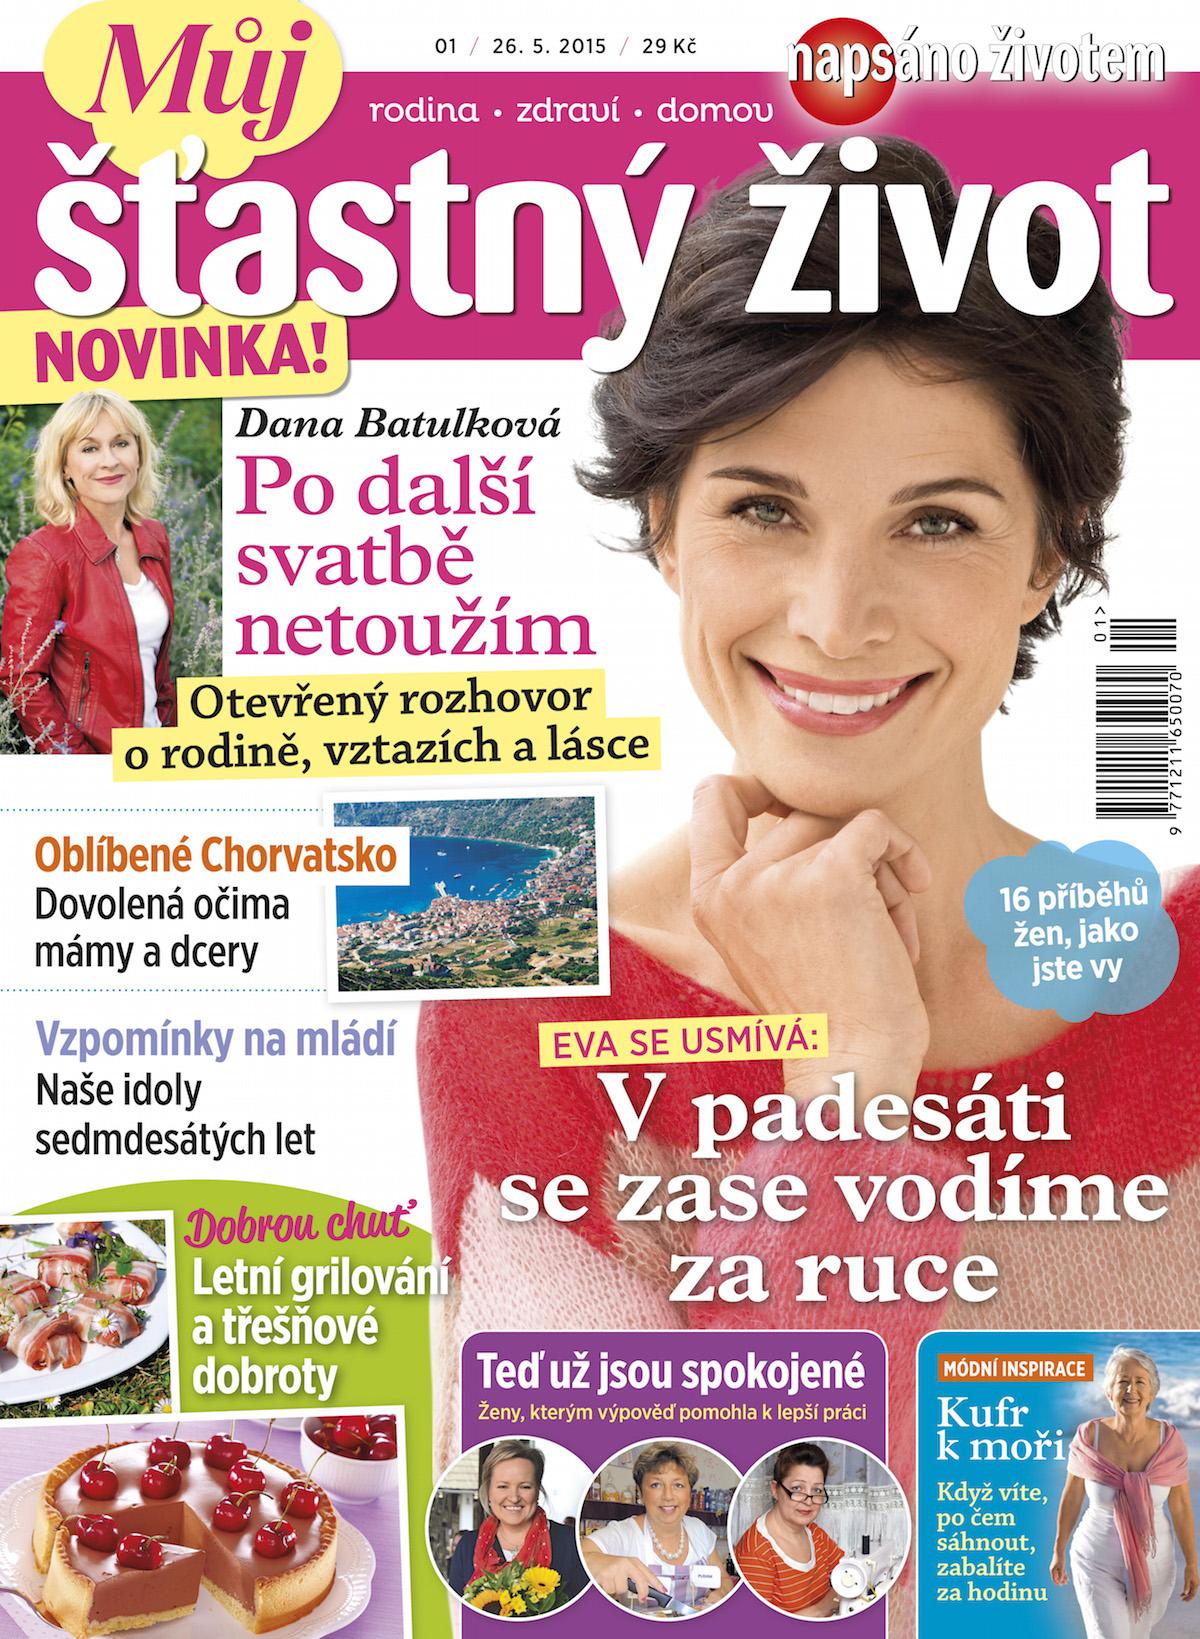 Titulní strana časopisu Můj šťastný život